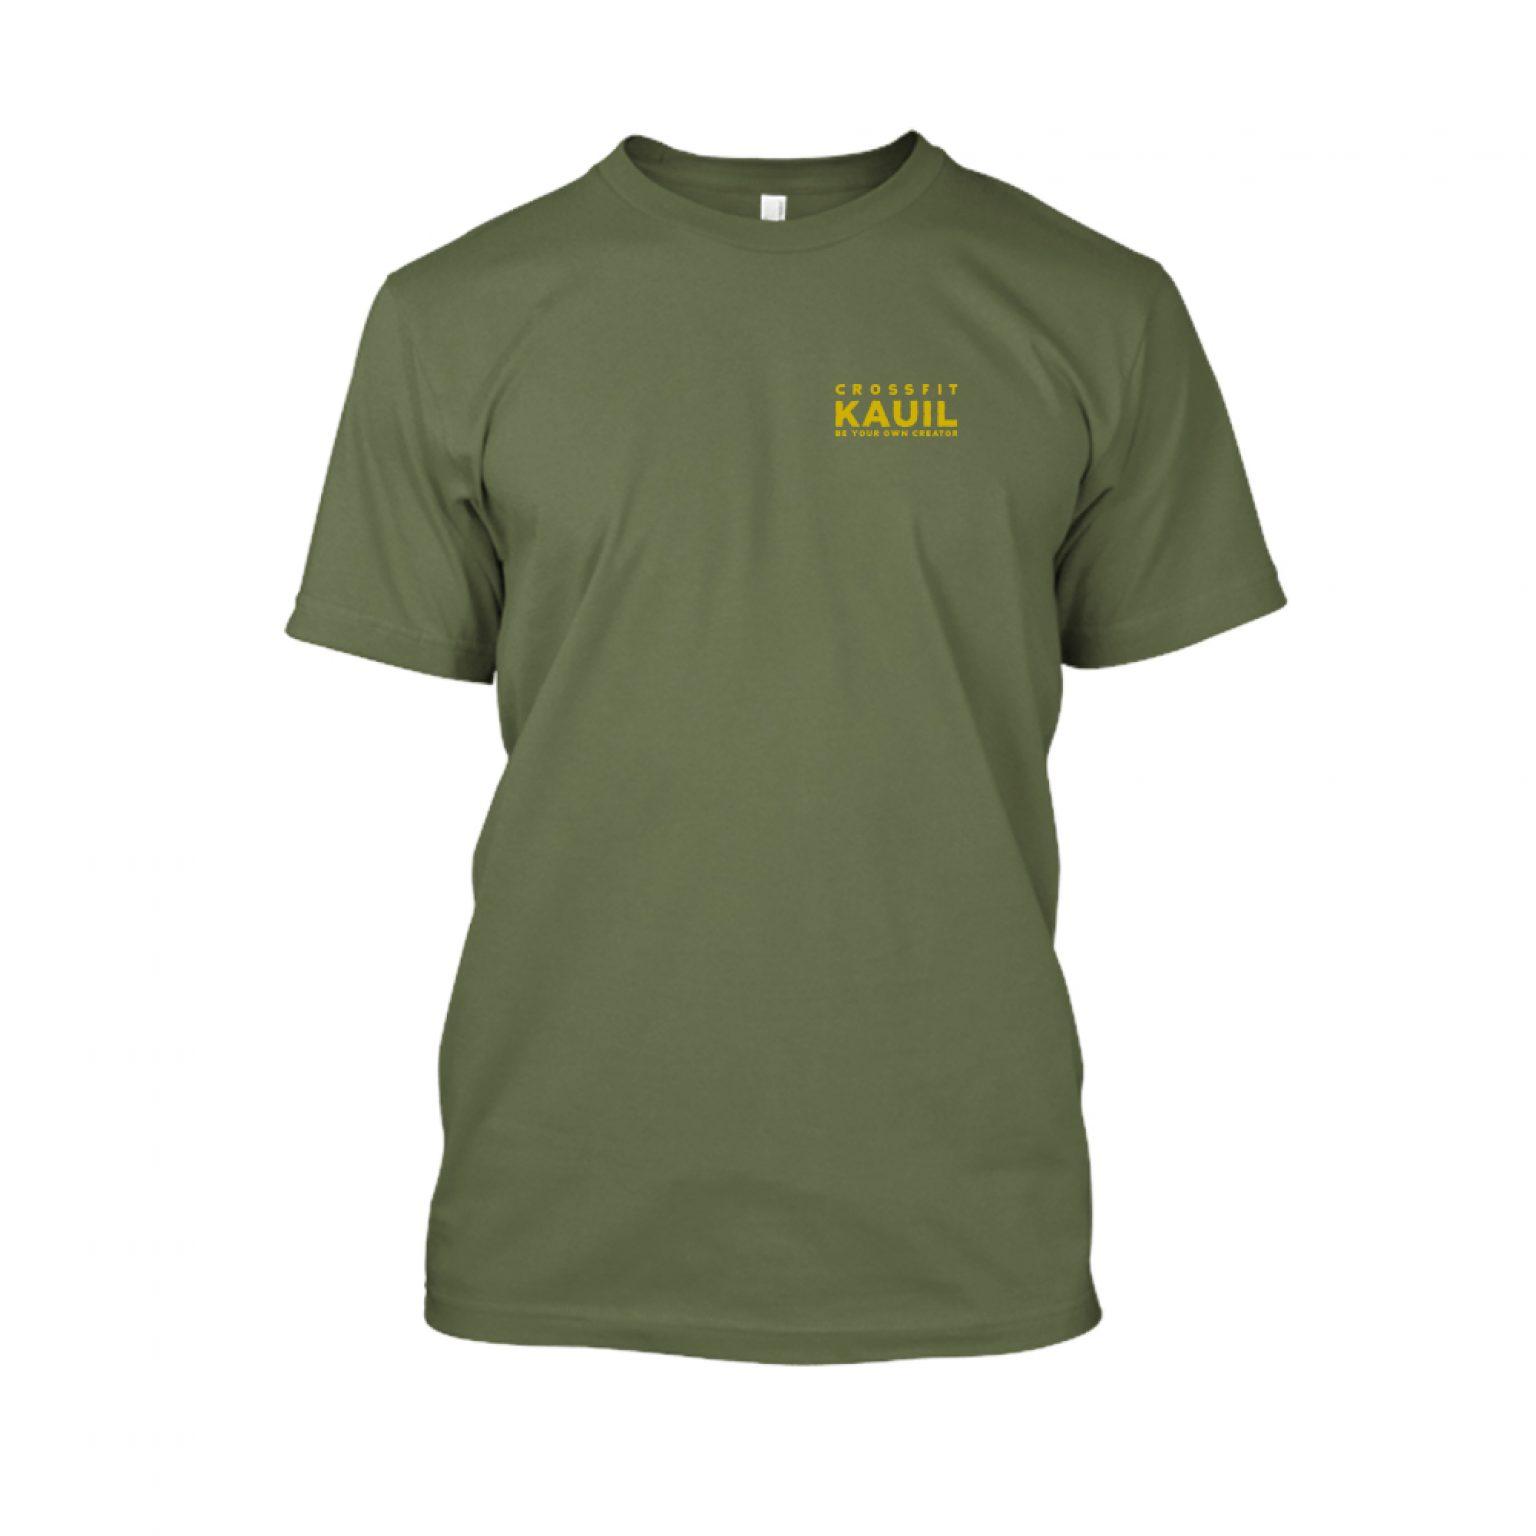 Herren Shirt Army2 gold front